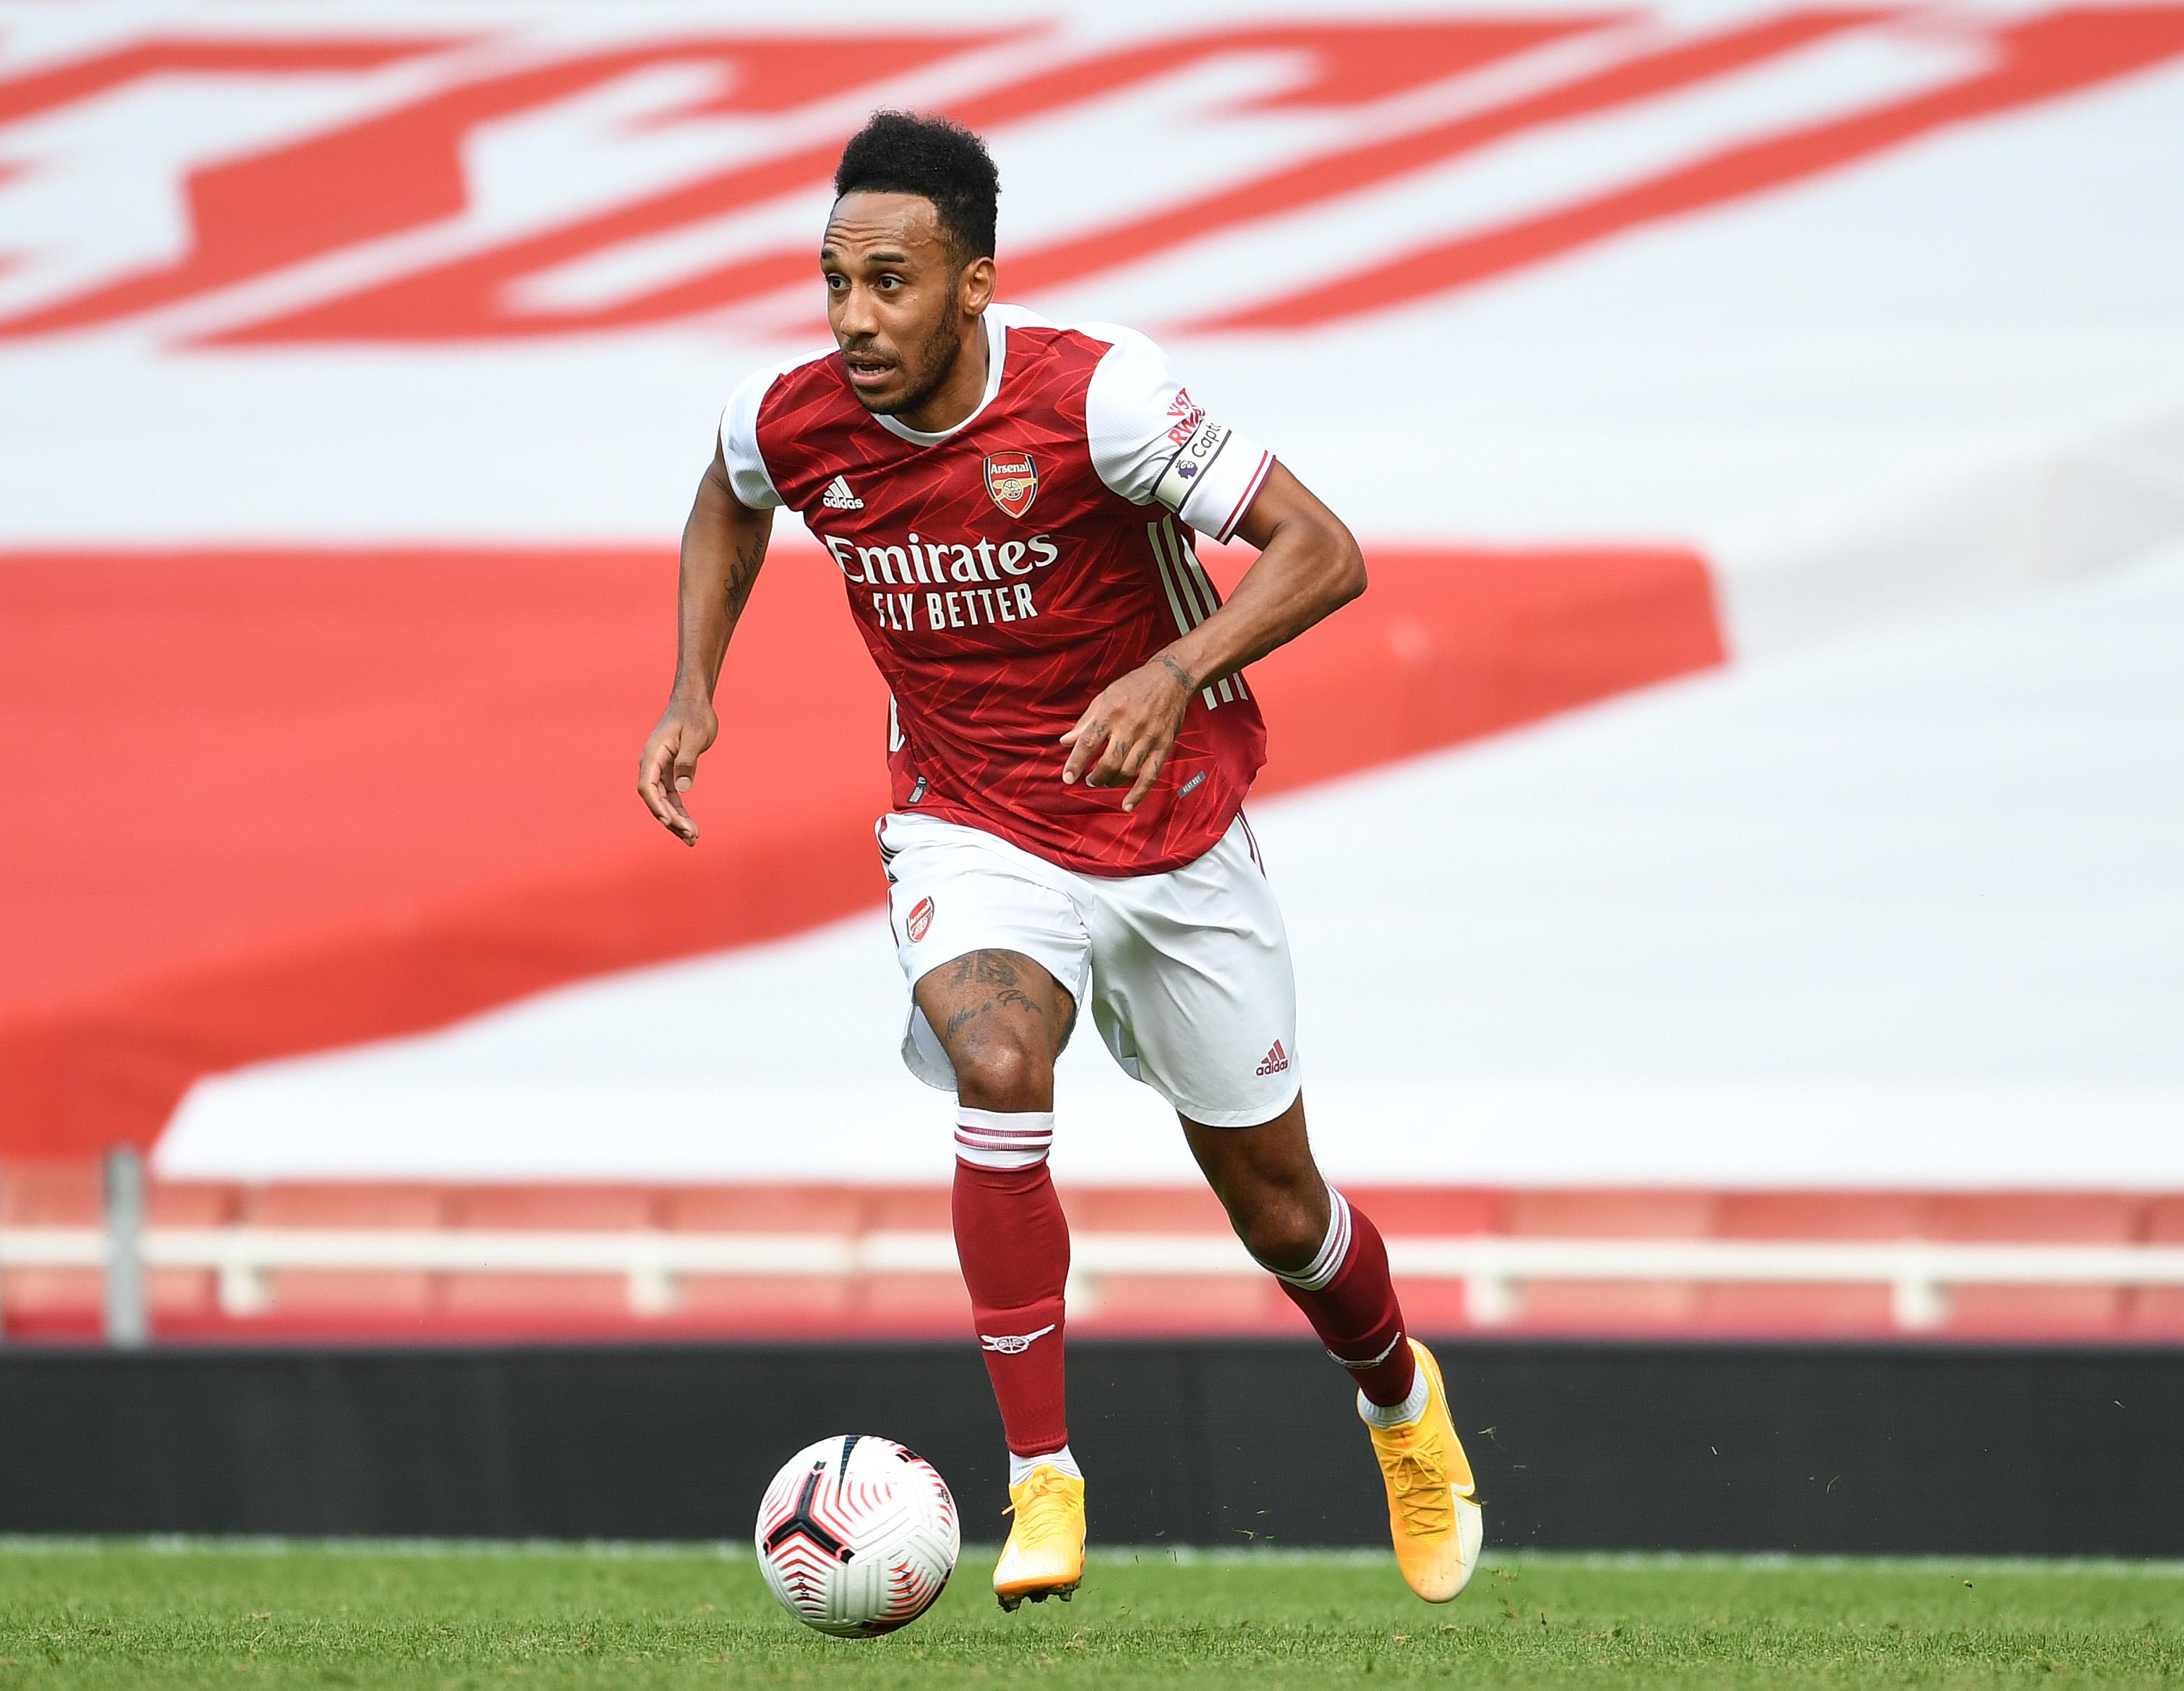 Pierre-Emerick Aubameyang - Arsenal - Premier League